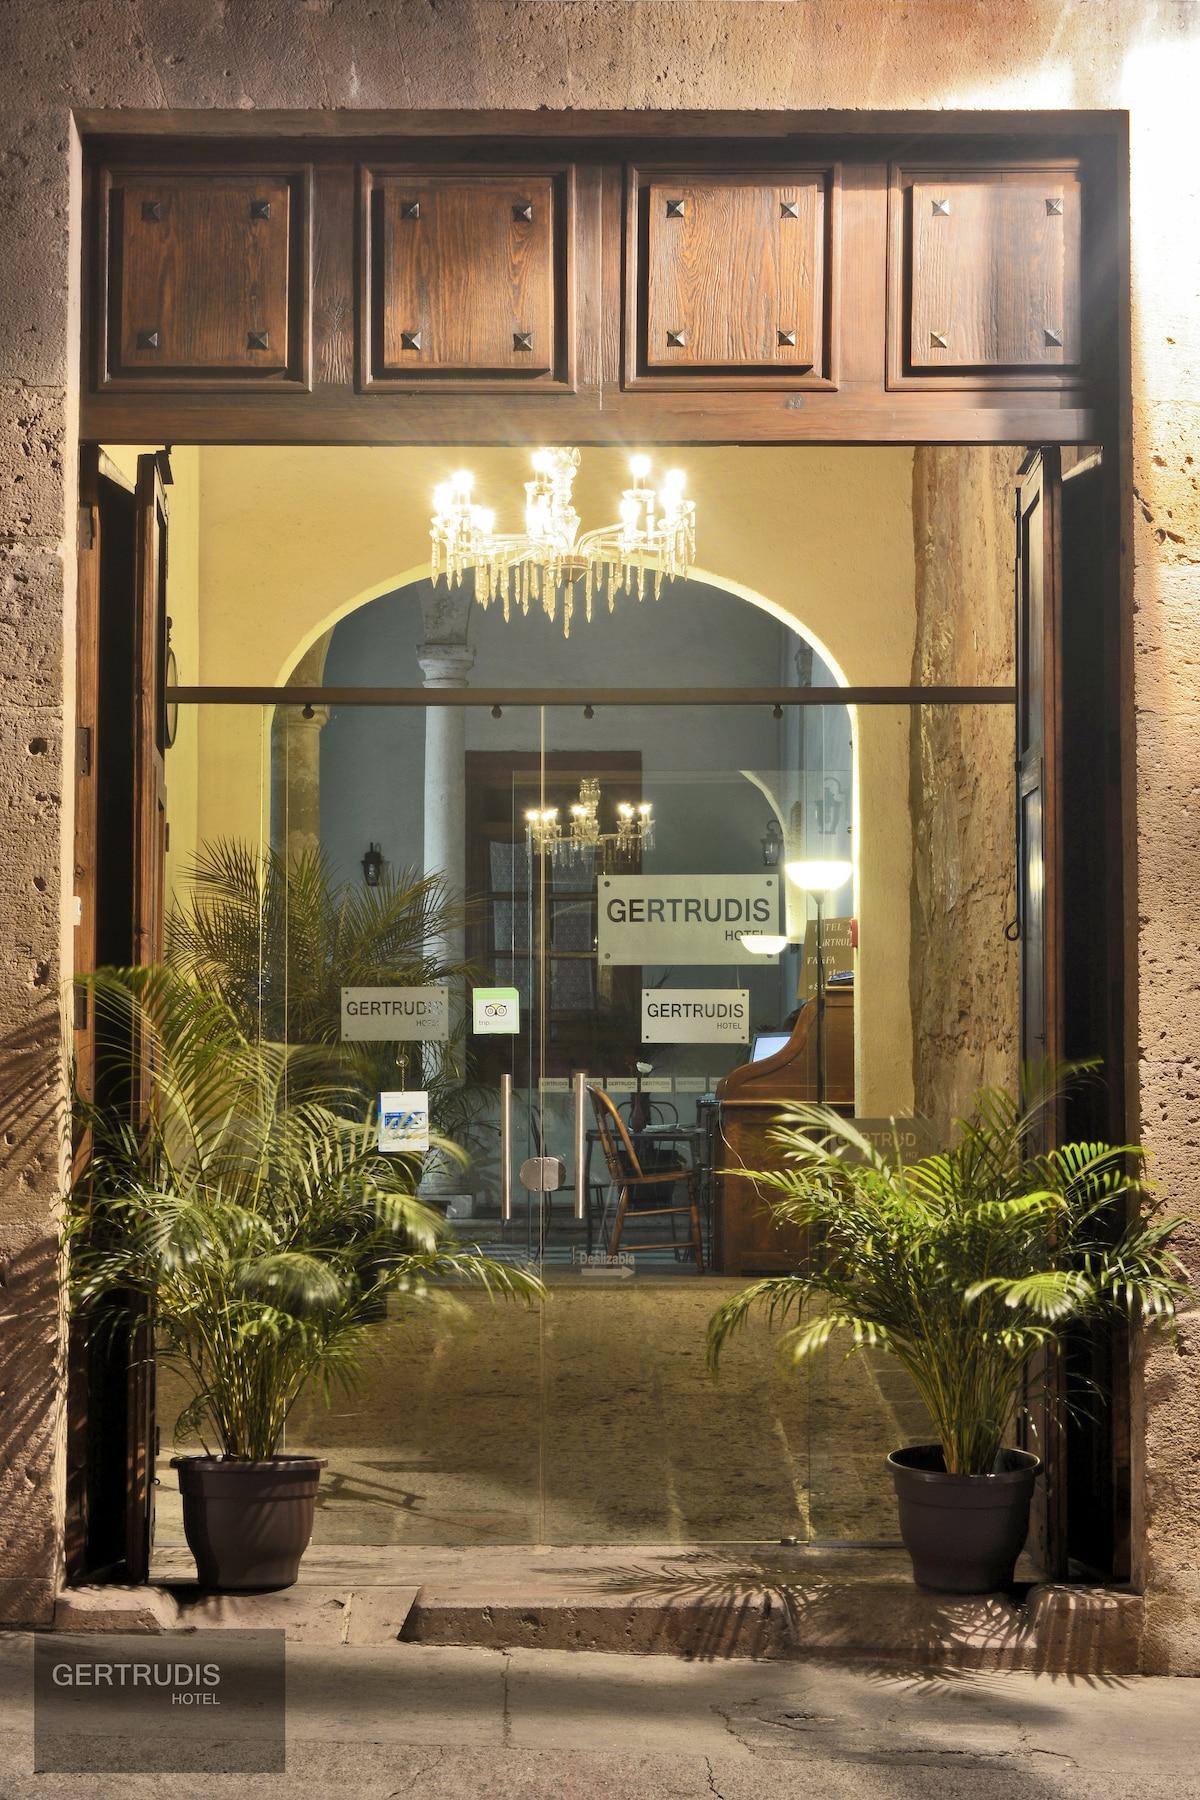 Gertrudis Hotel